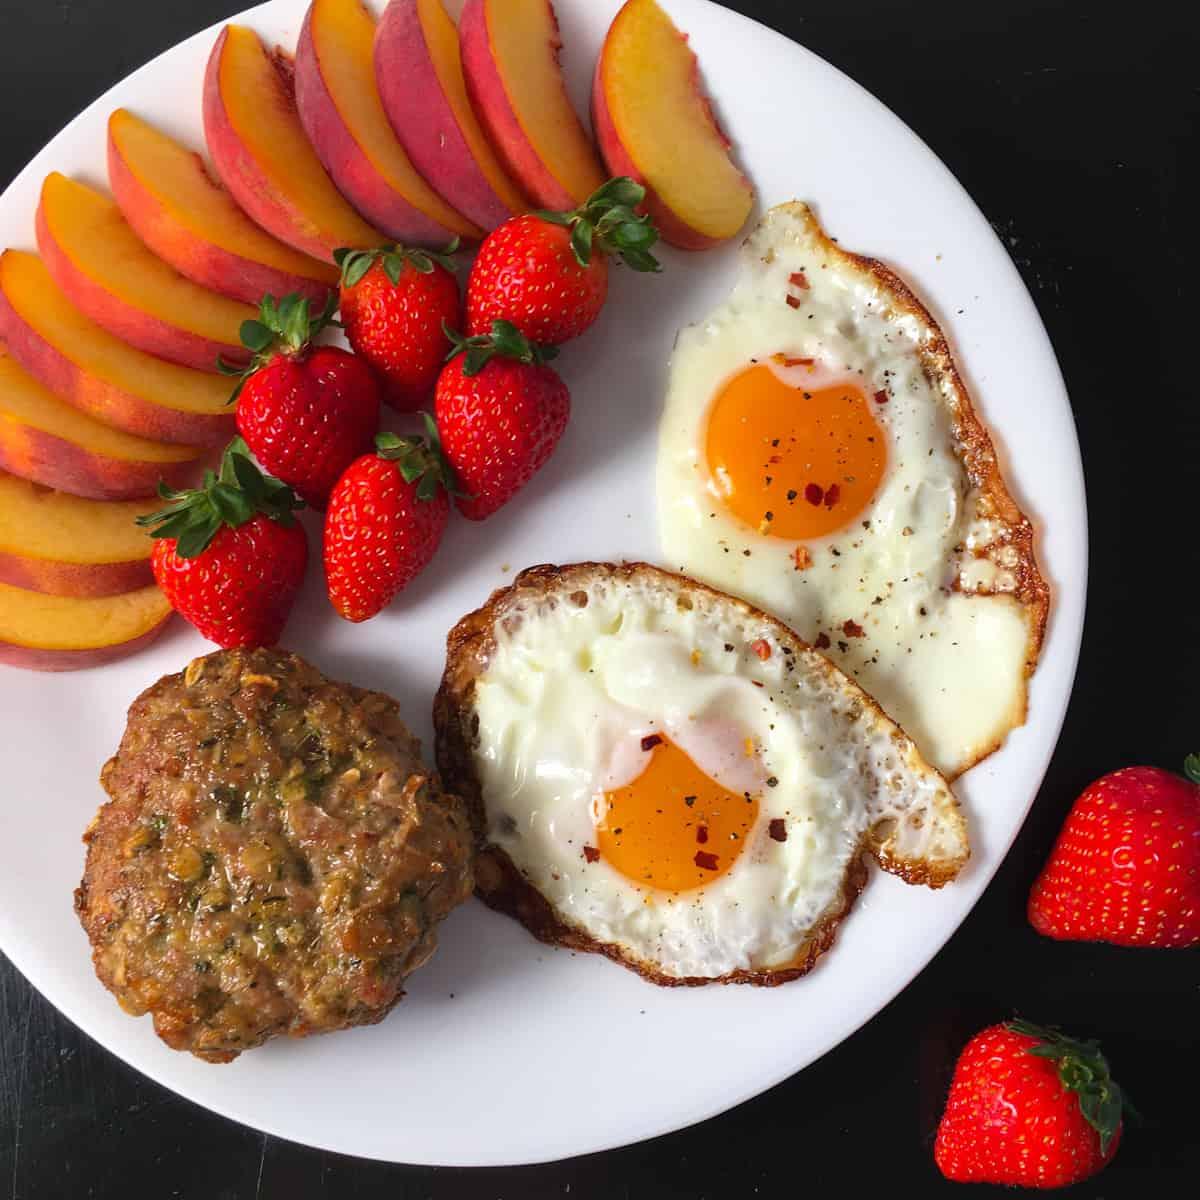 sausage eggs peaches strawberries